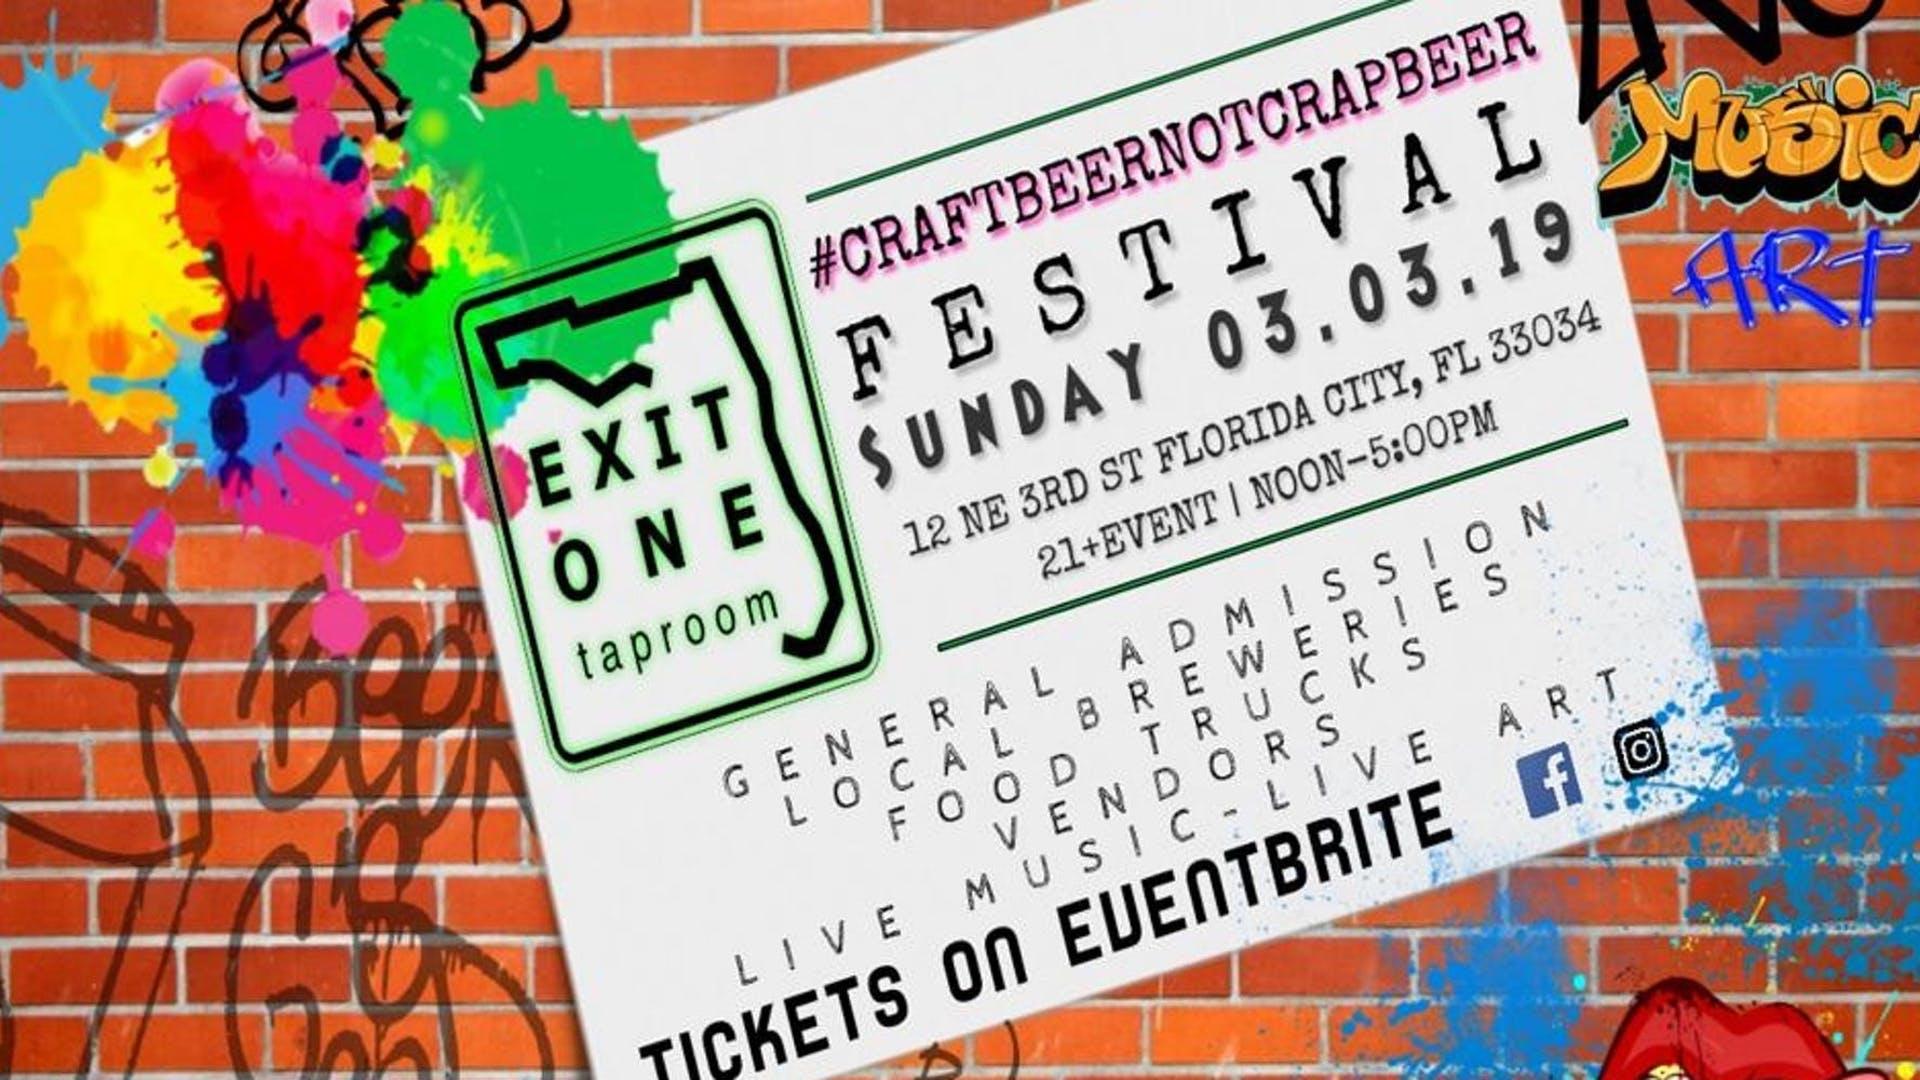 ExitOne Taproom Fest